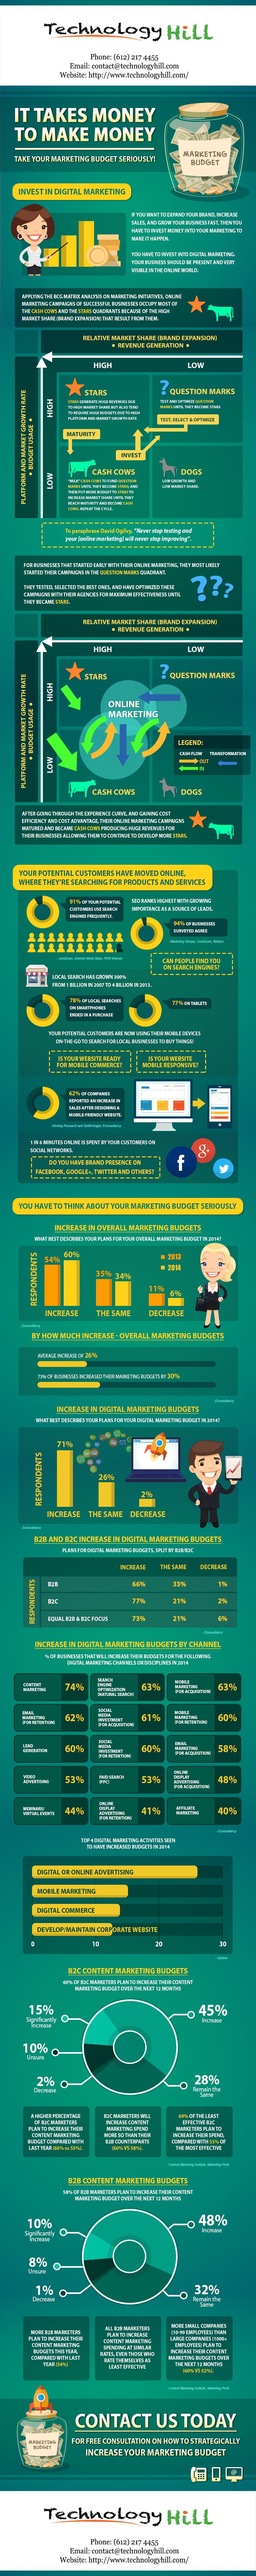 TechnologyHill.com-Marketing-Budget-Infographic-Blogl